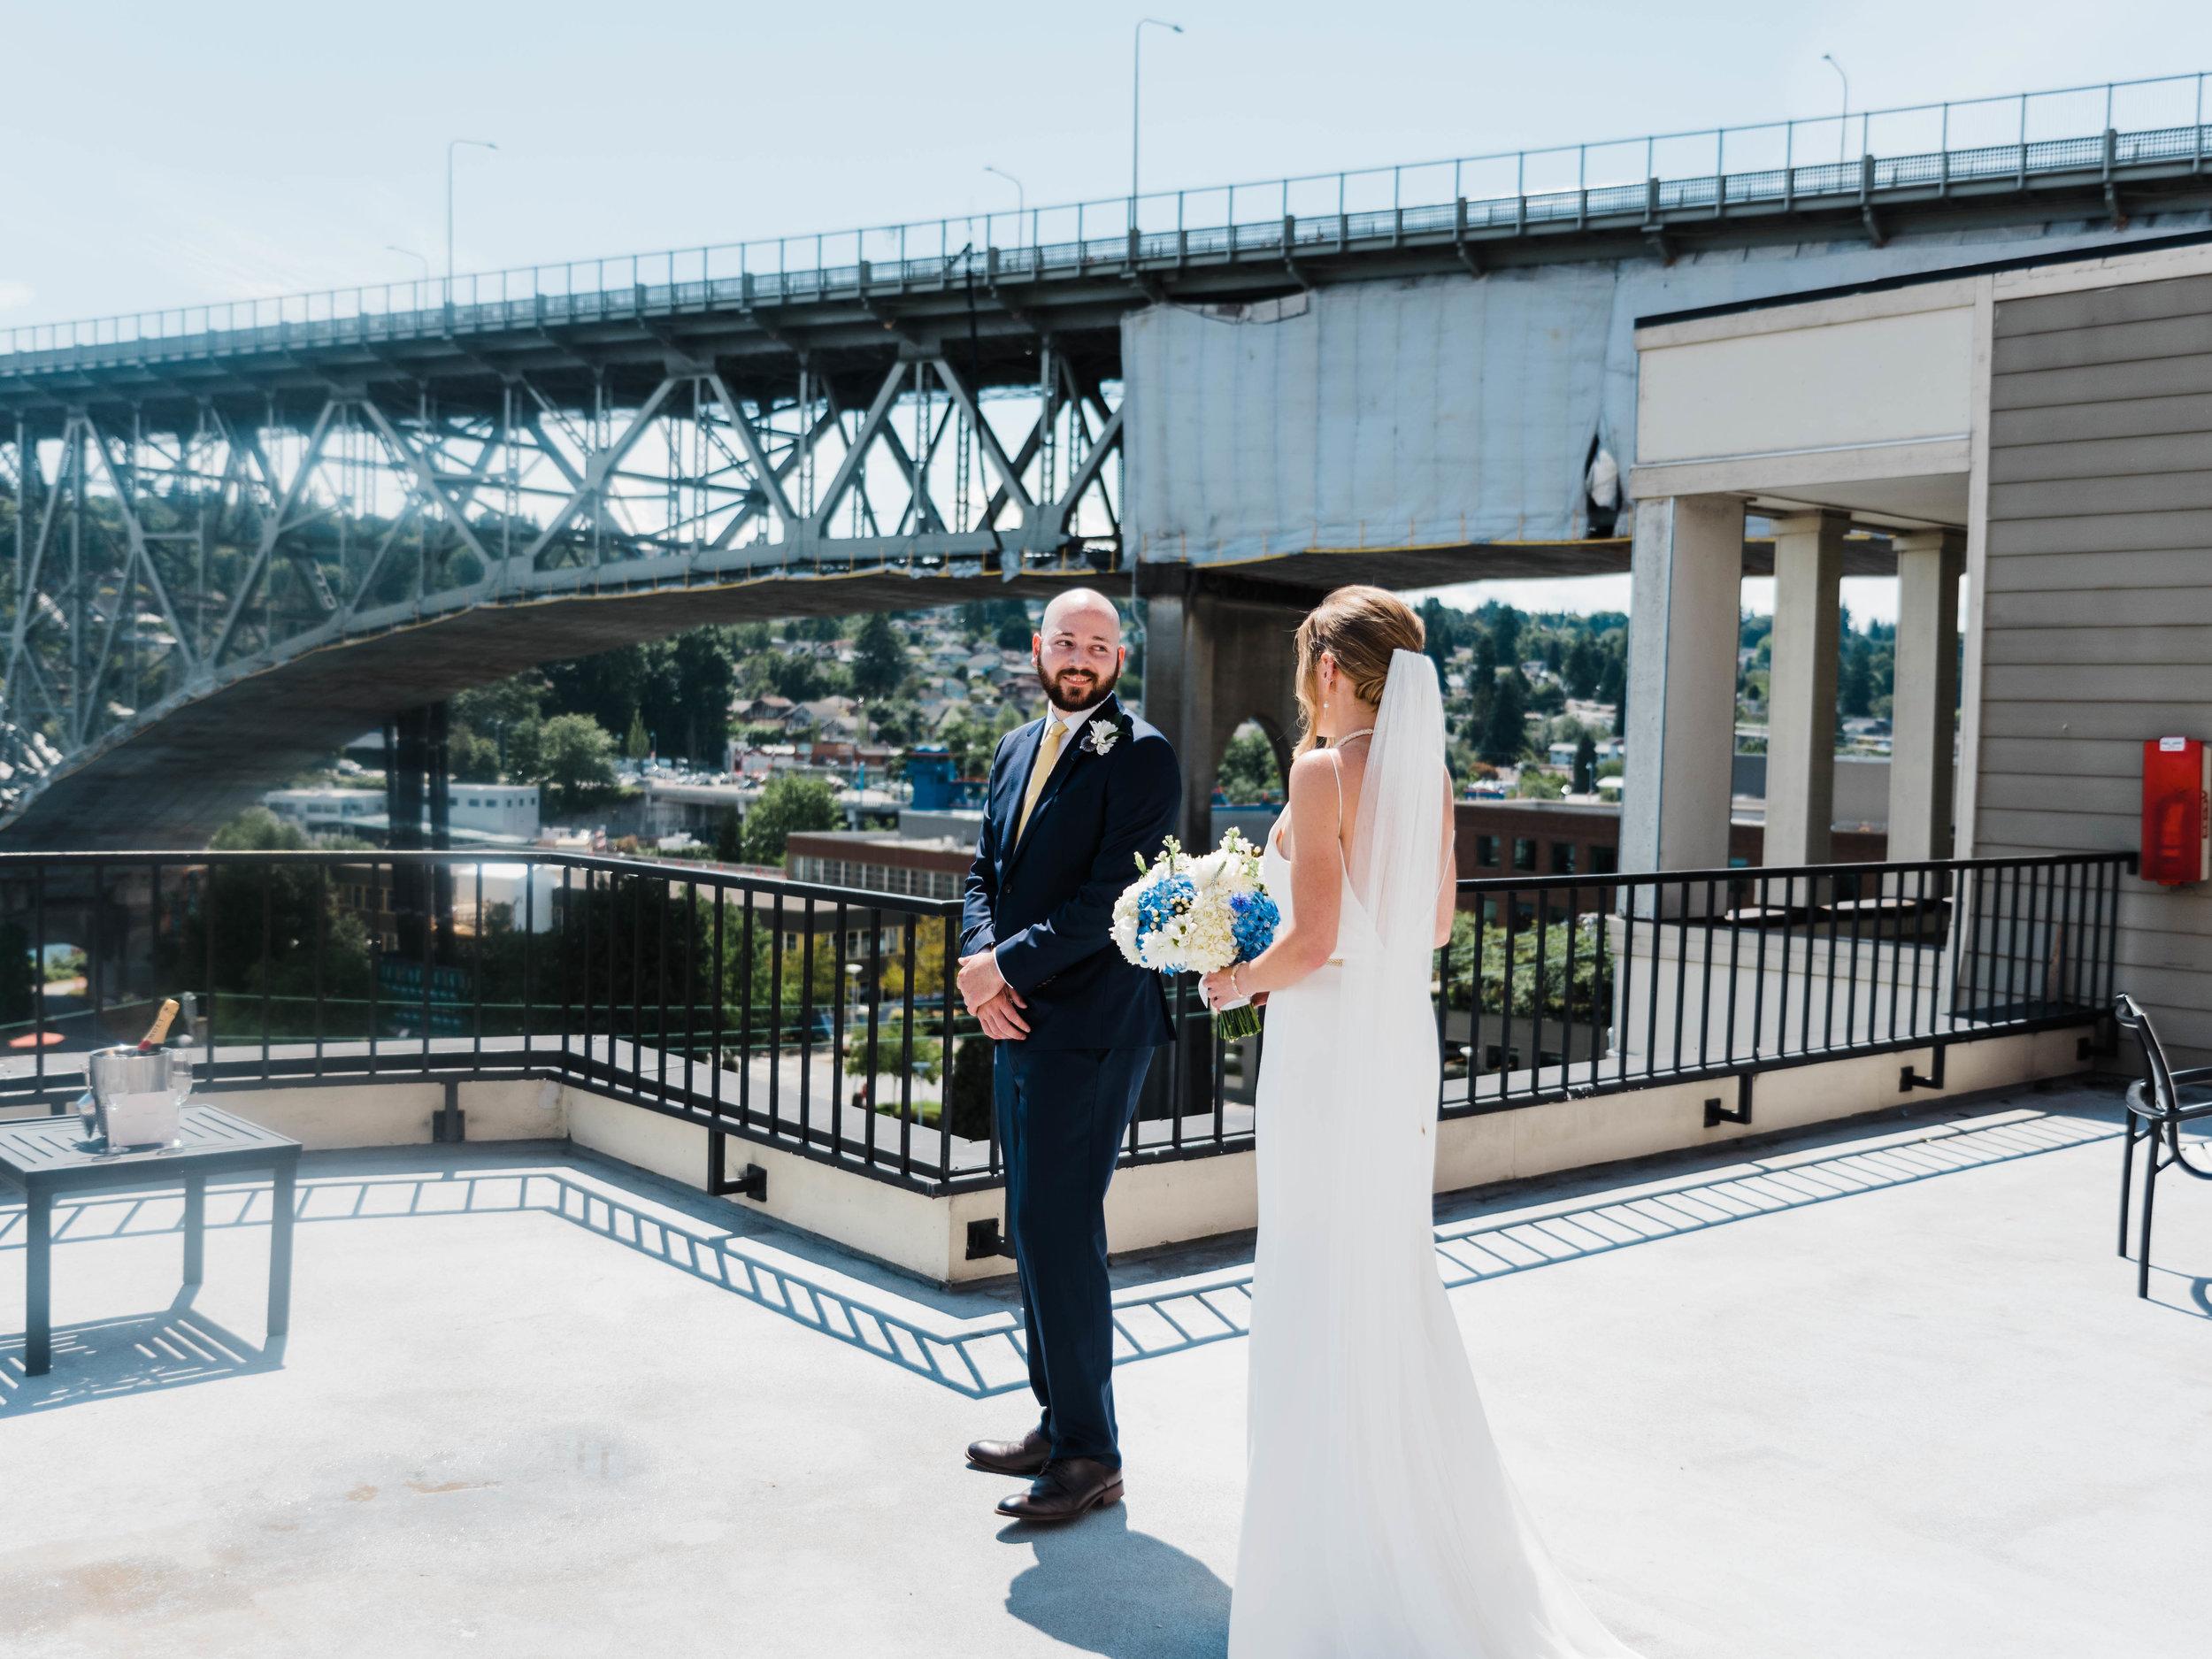 Seattle Wedding- MV Skansonia - Anna + Josh -  (300) - Copy.jpg